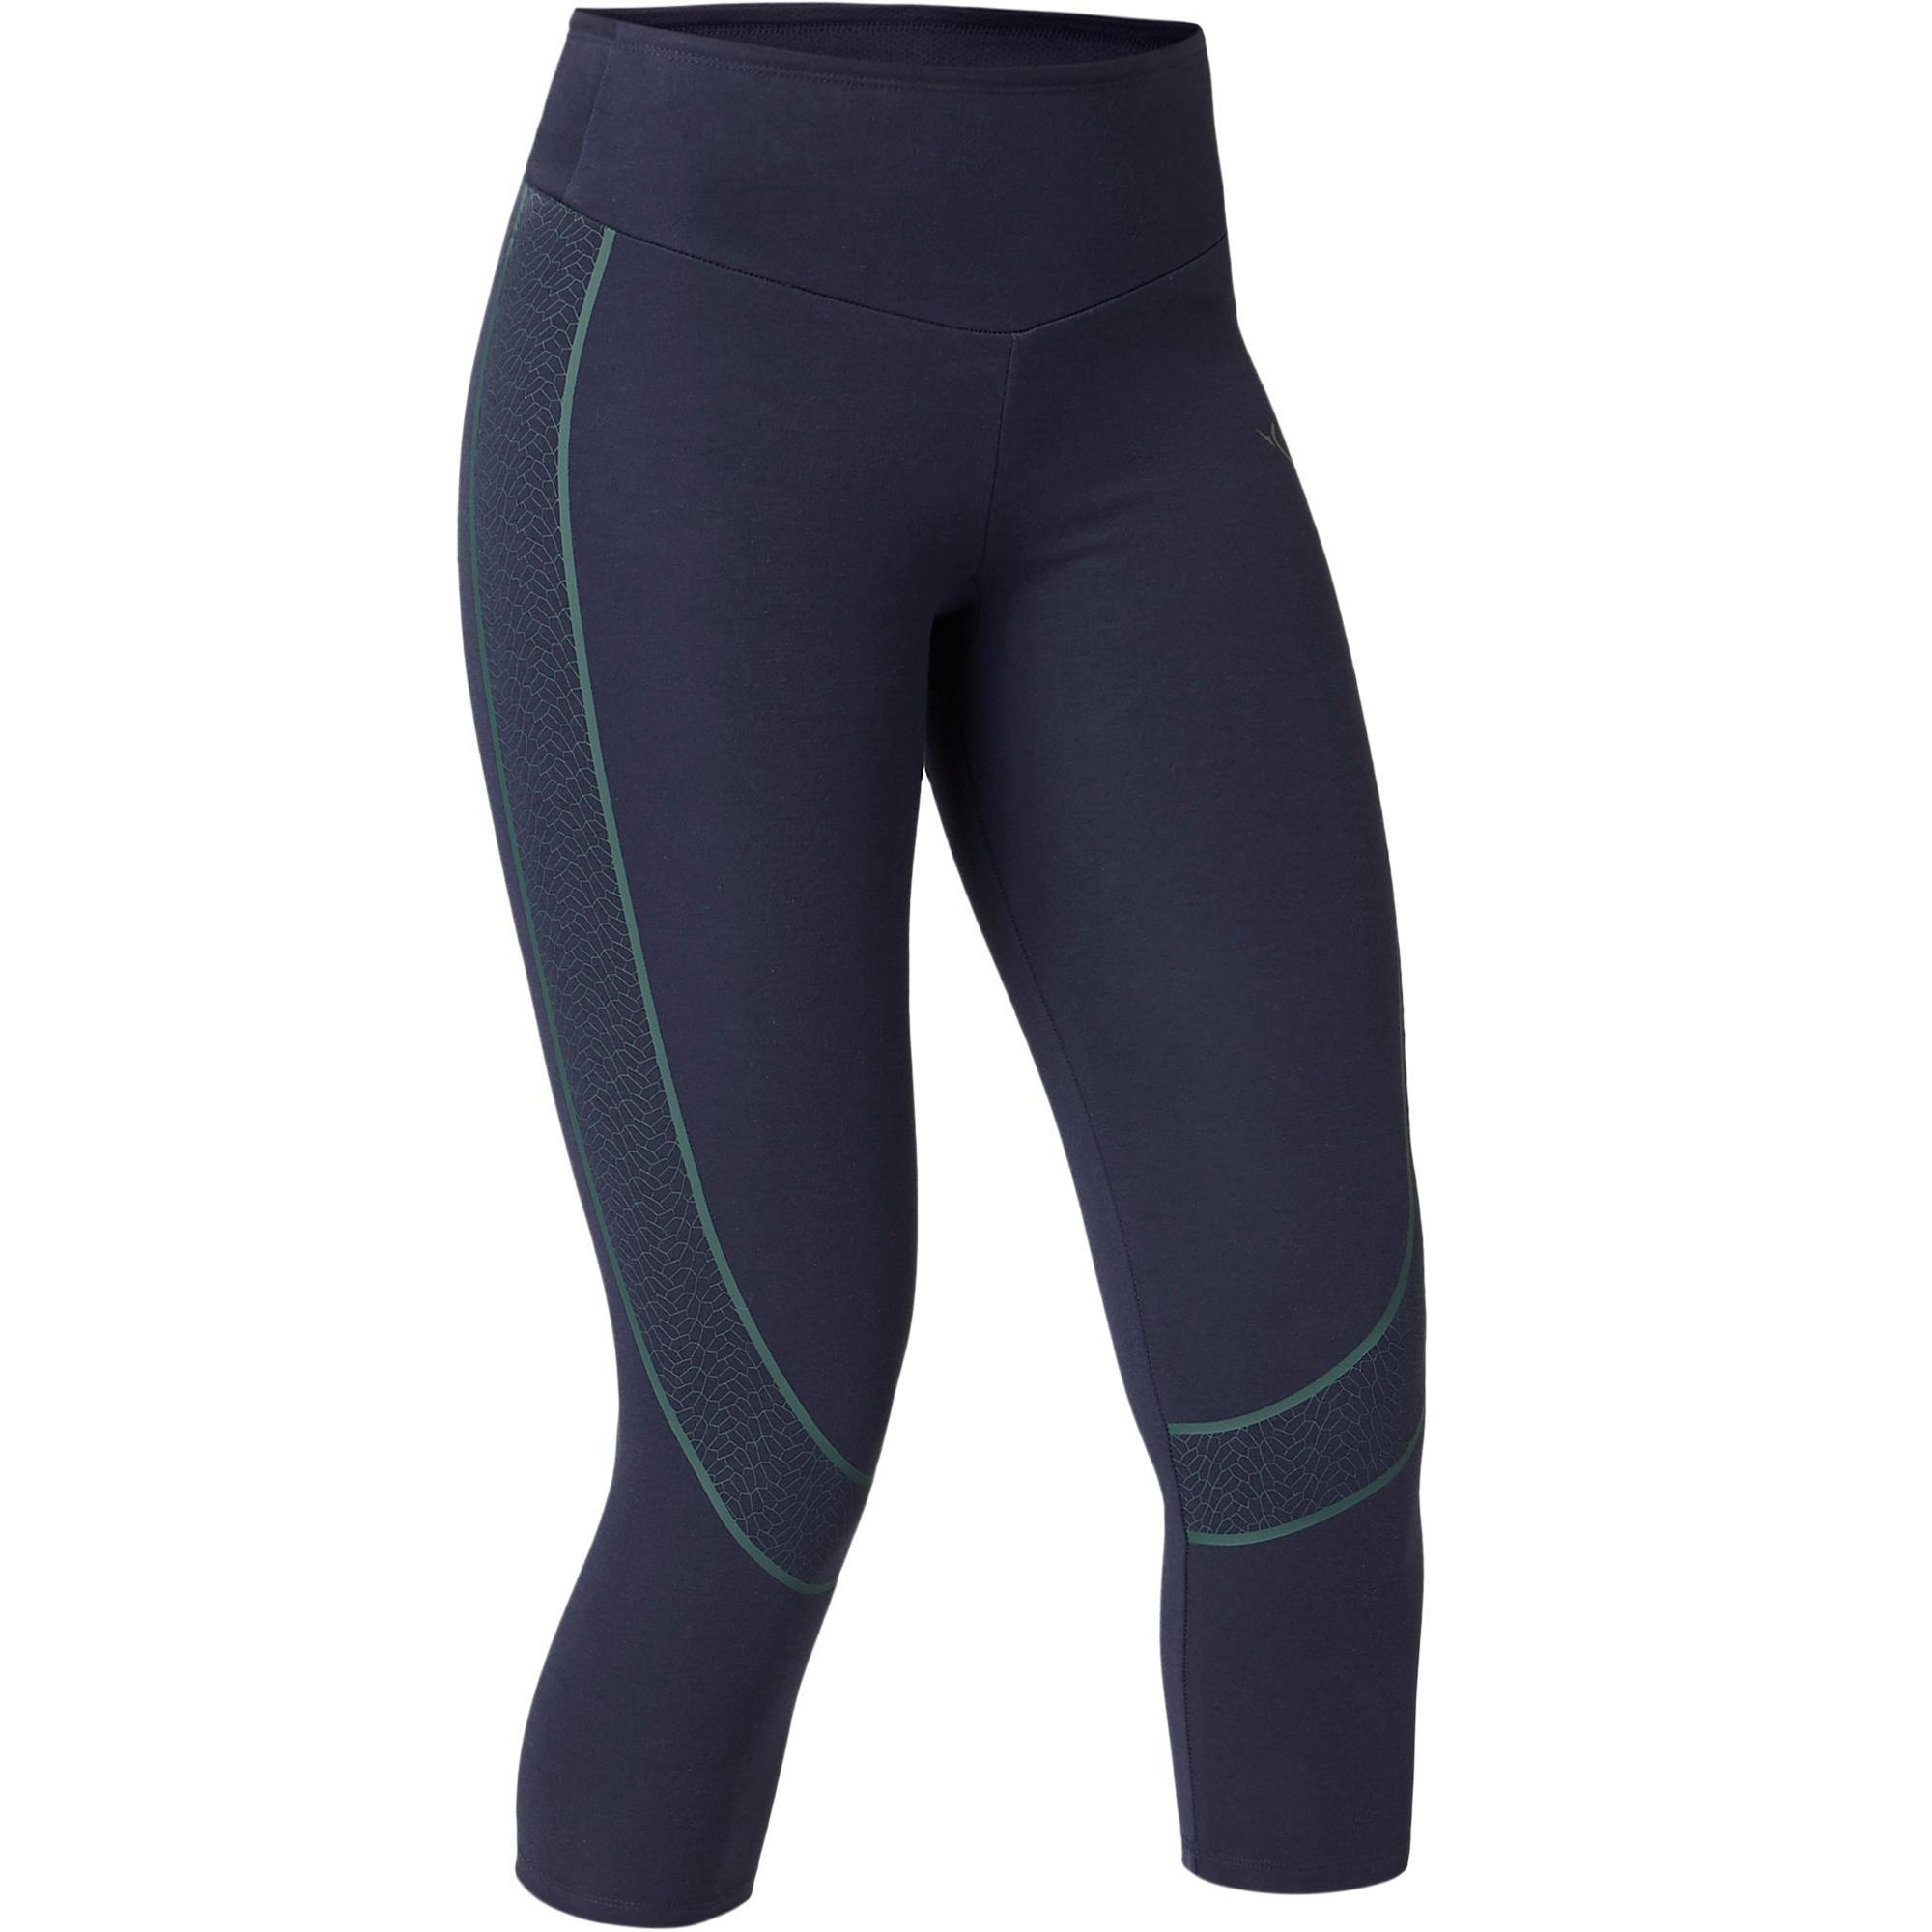 Legging 78 galbant sport pilates gym douce femme slim bleu marine domyos